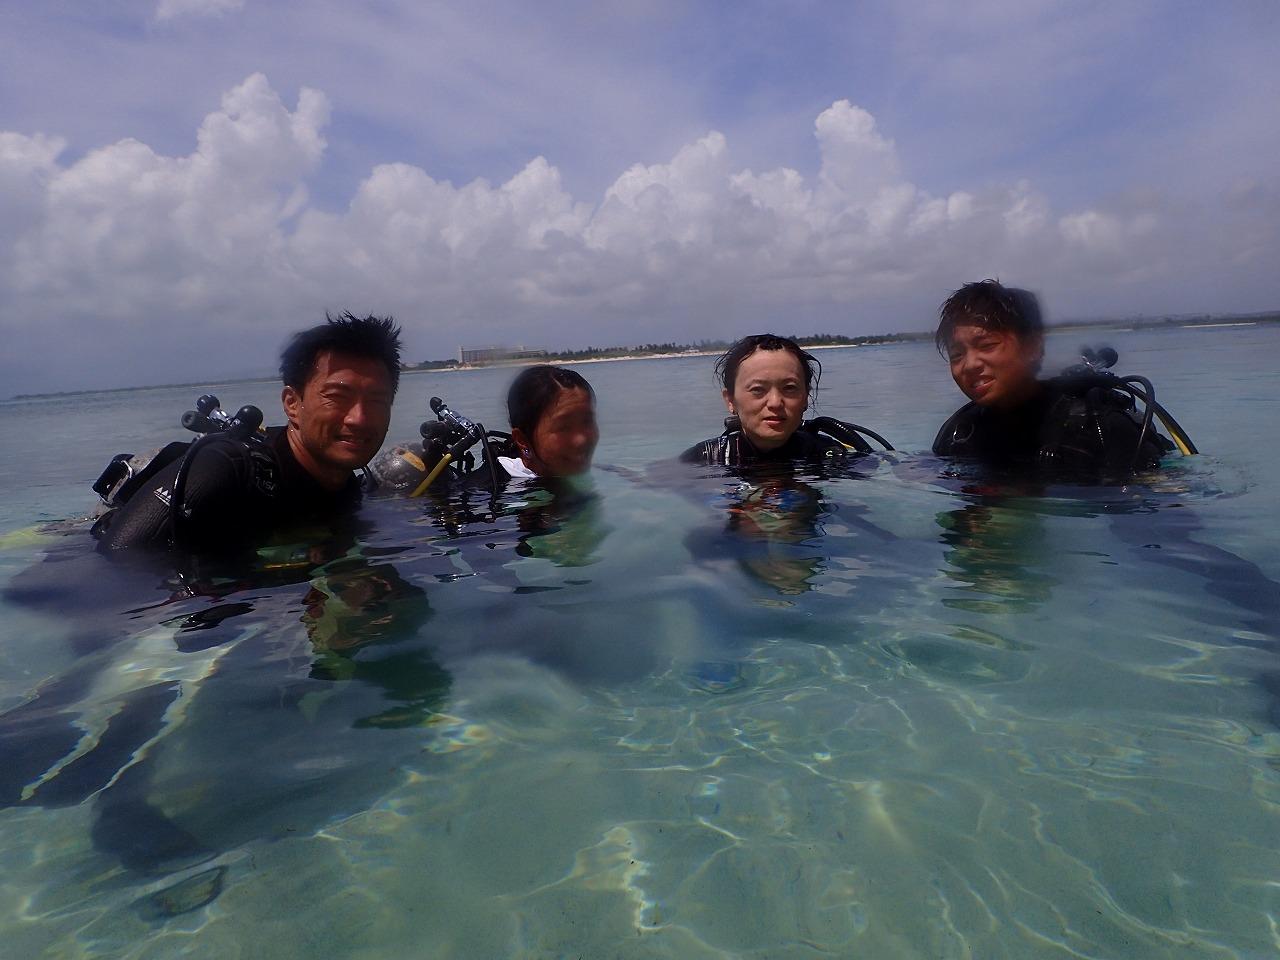 Uファミリー体験ダイビング終了後